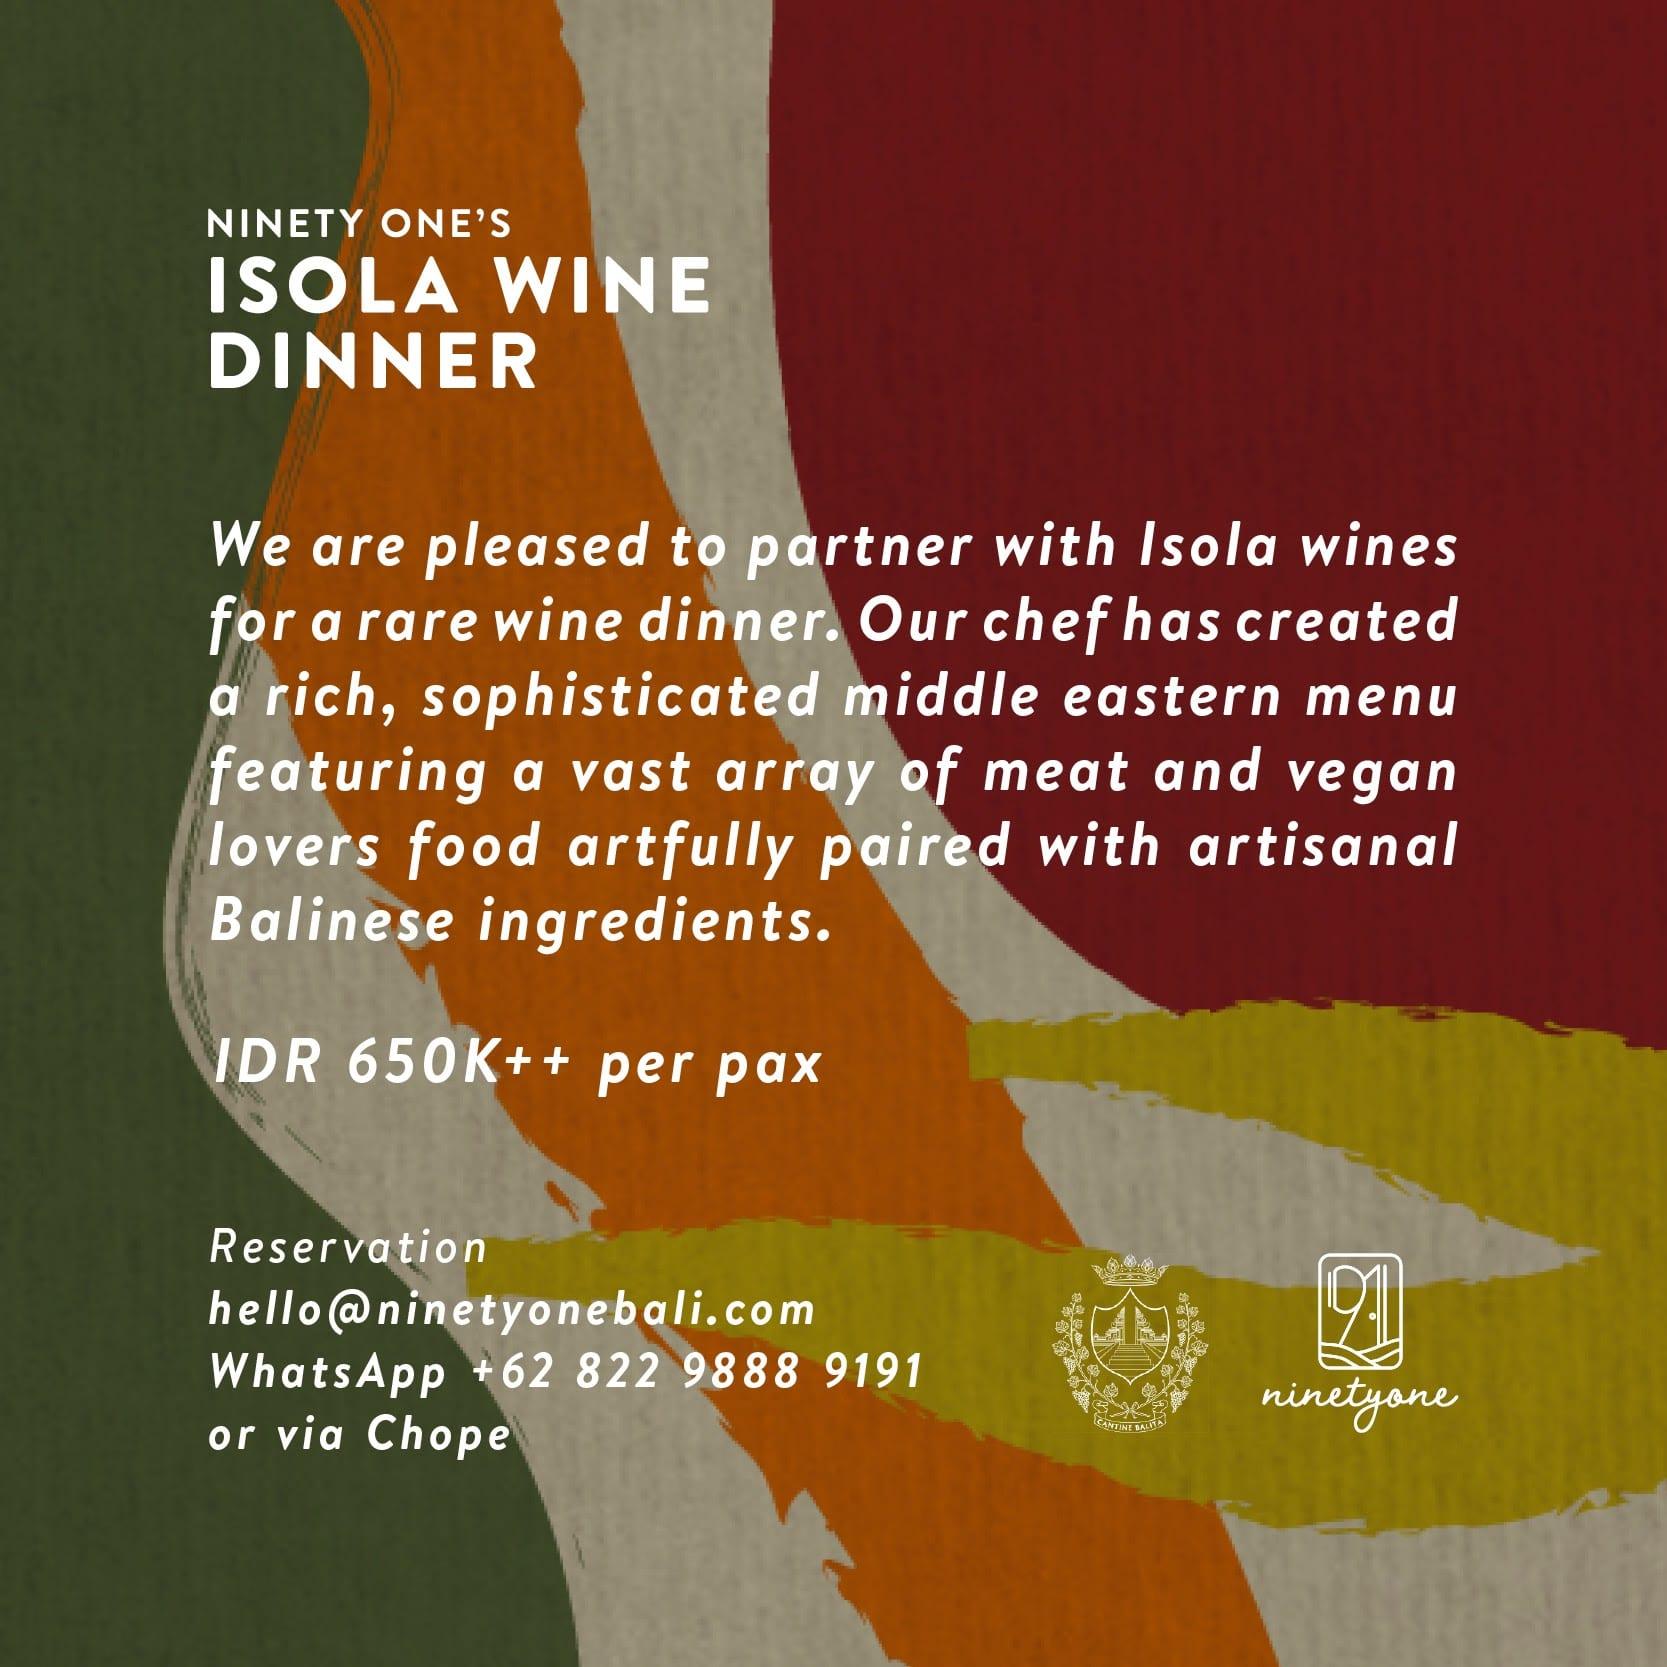 Isola Wine Dinner at Ninety one